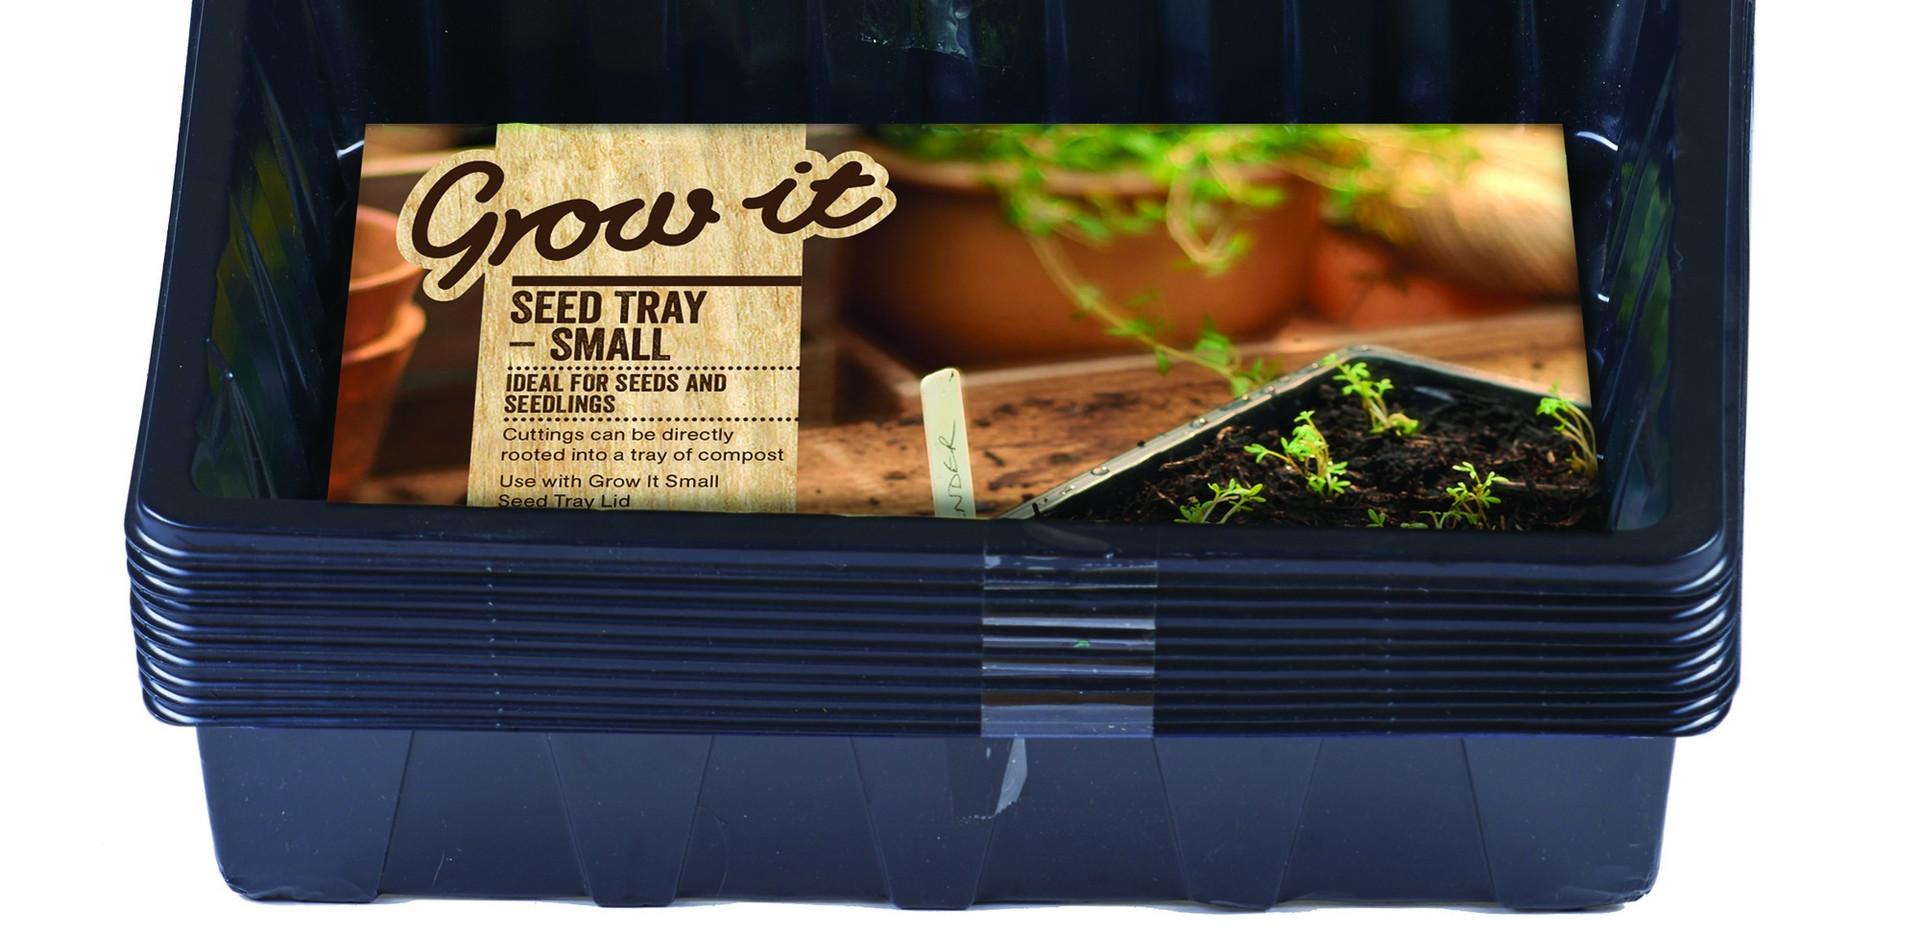 Small Seed Tray